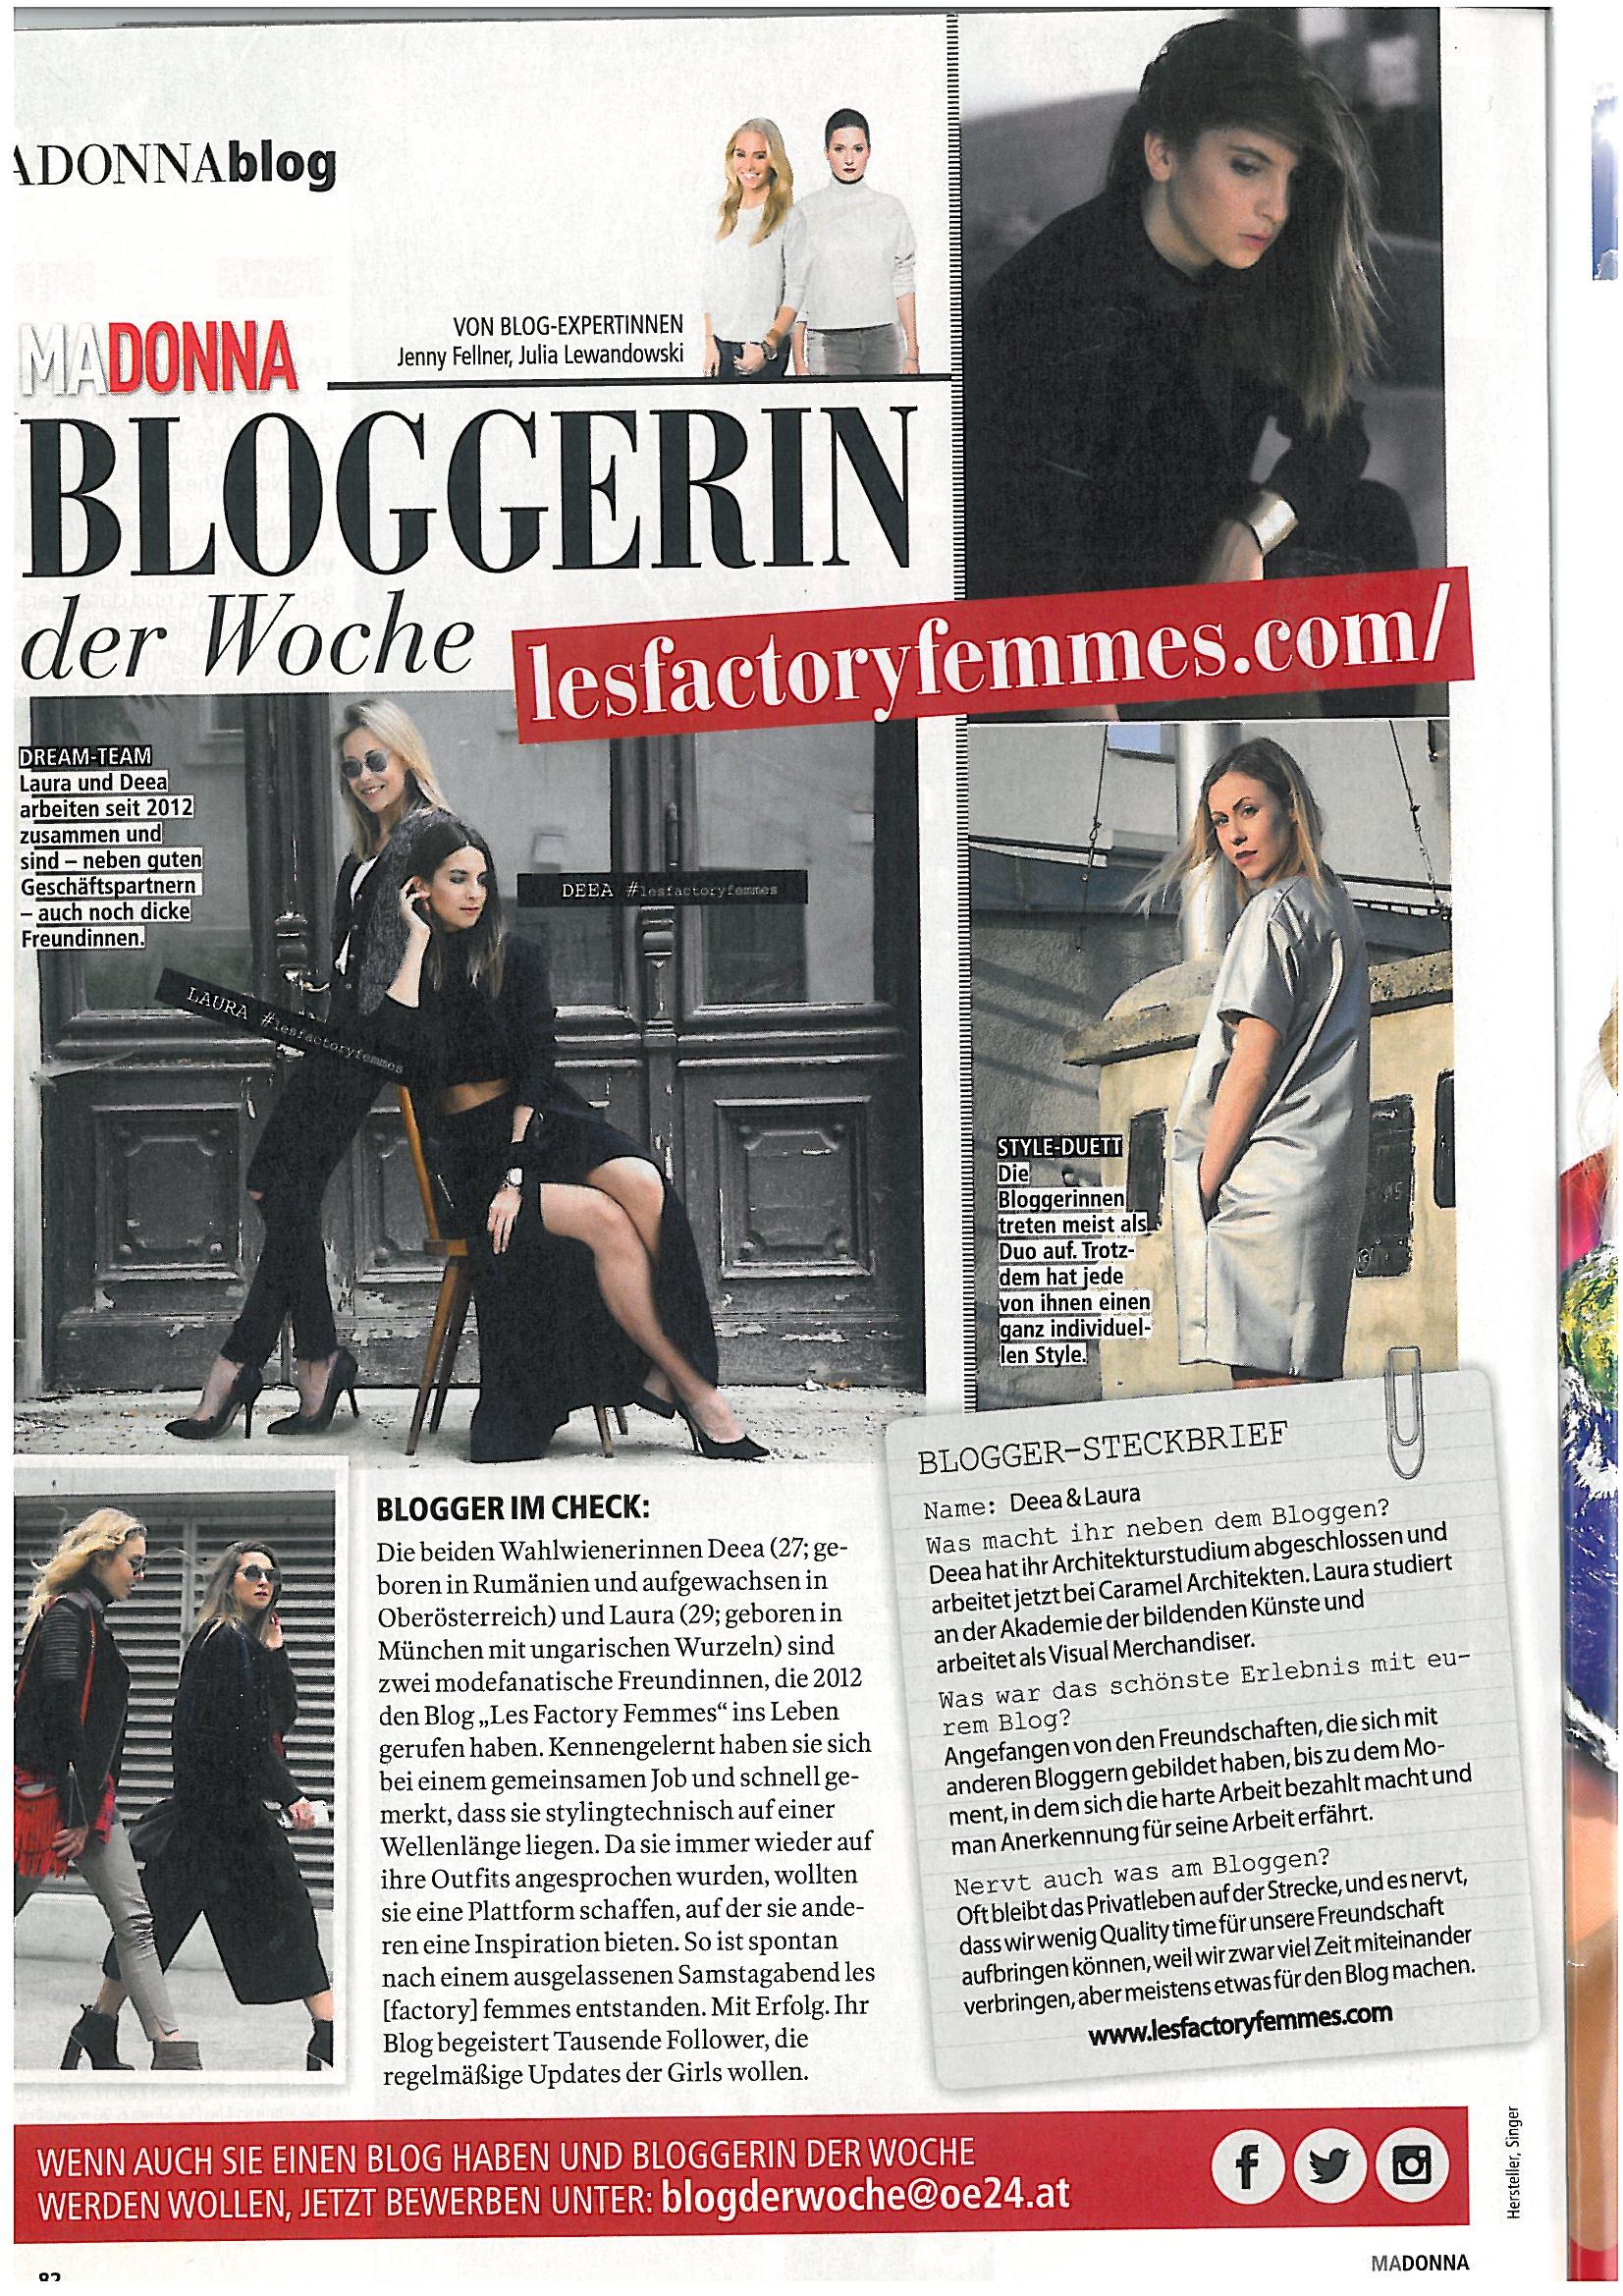 madonna magazin - www.lesfactoryfemmes.com